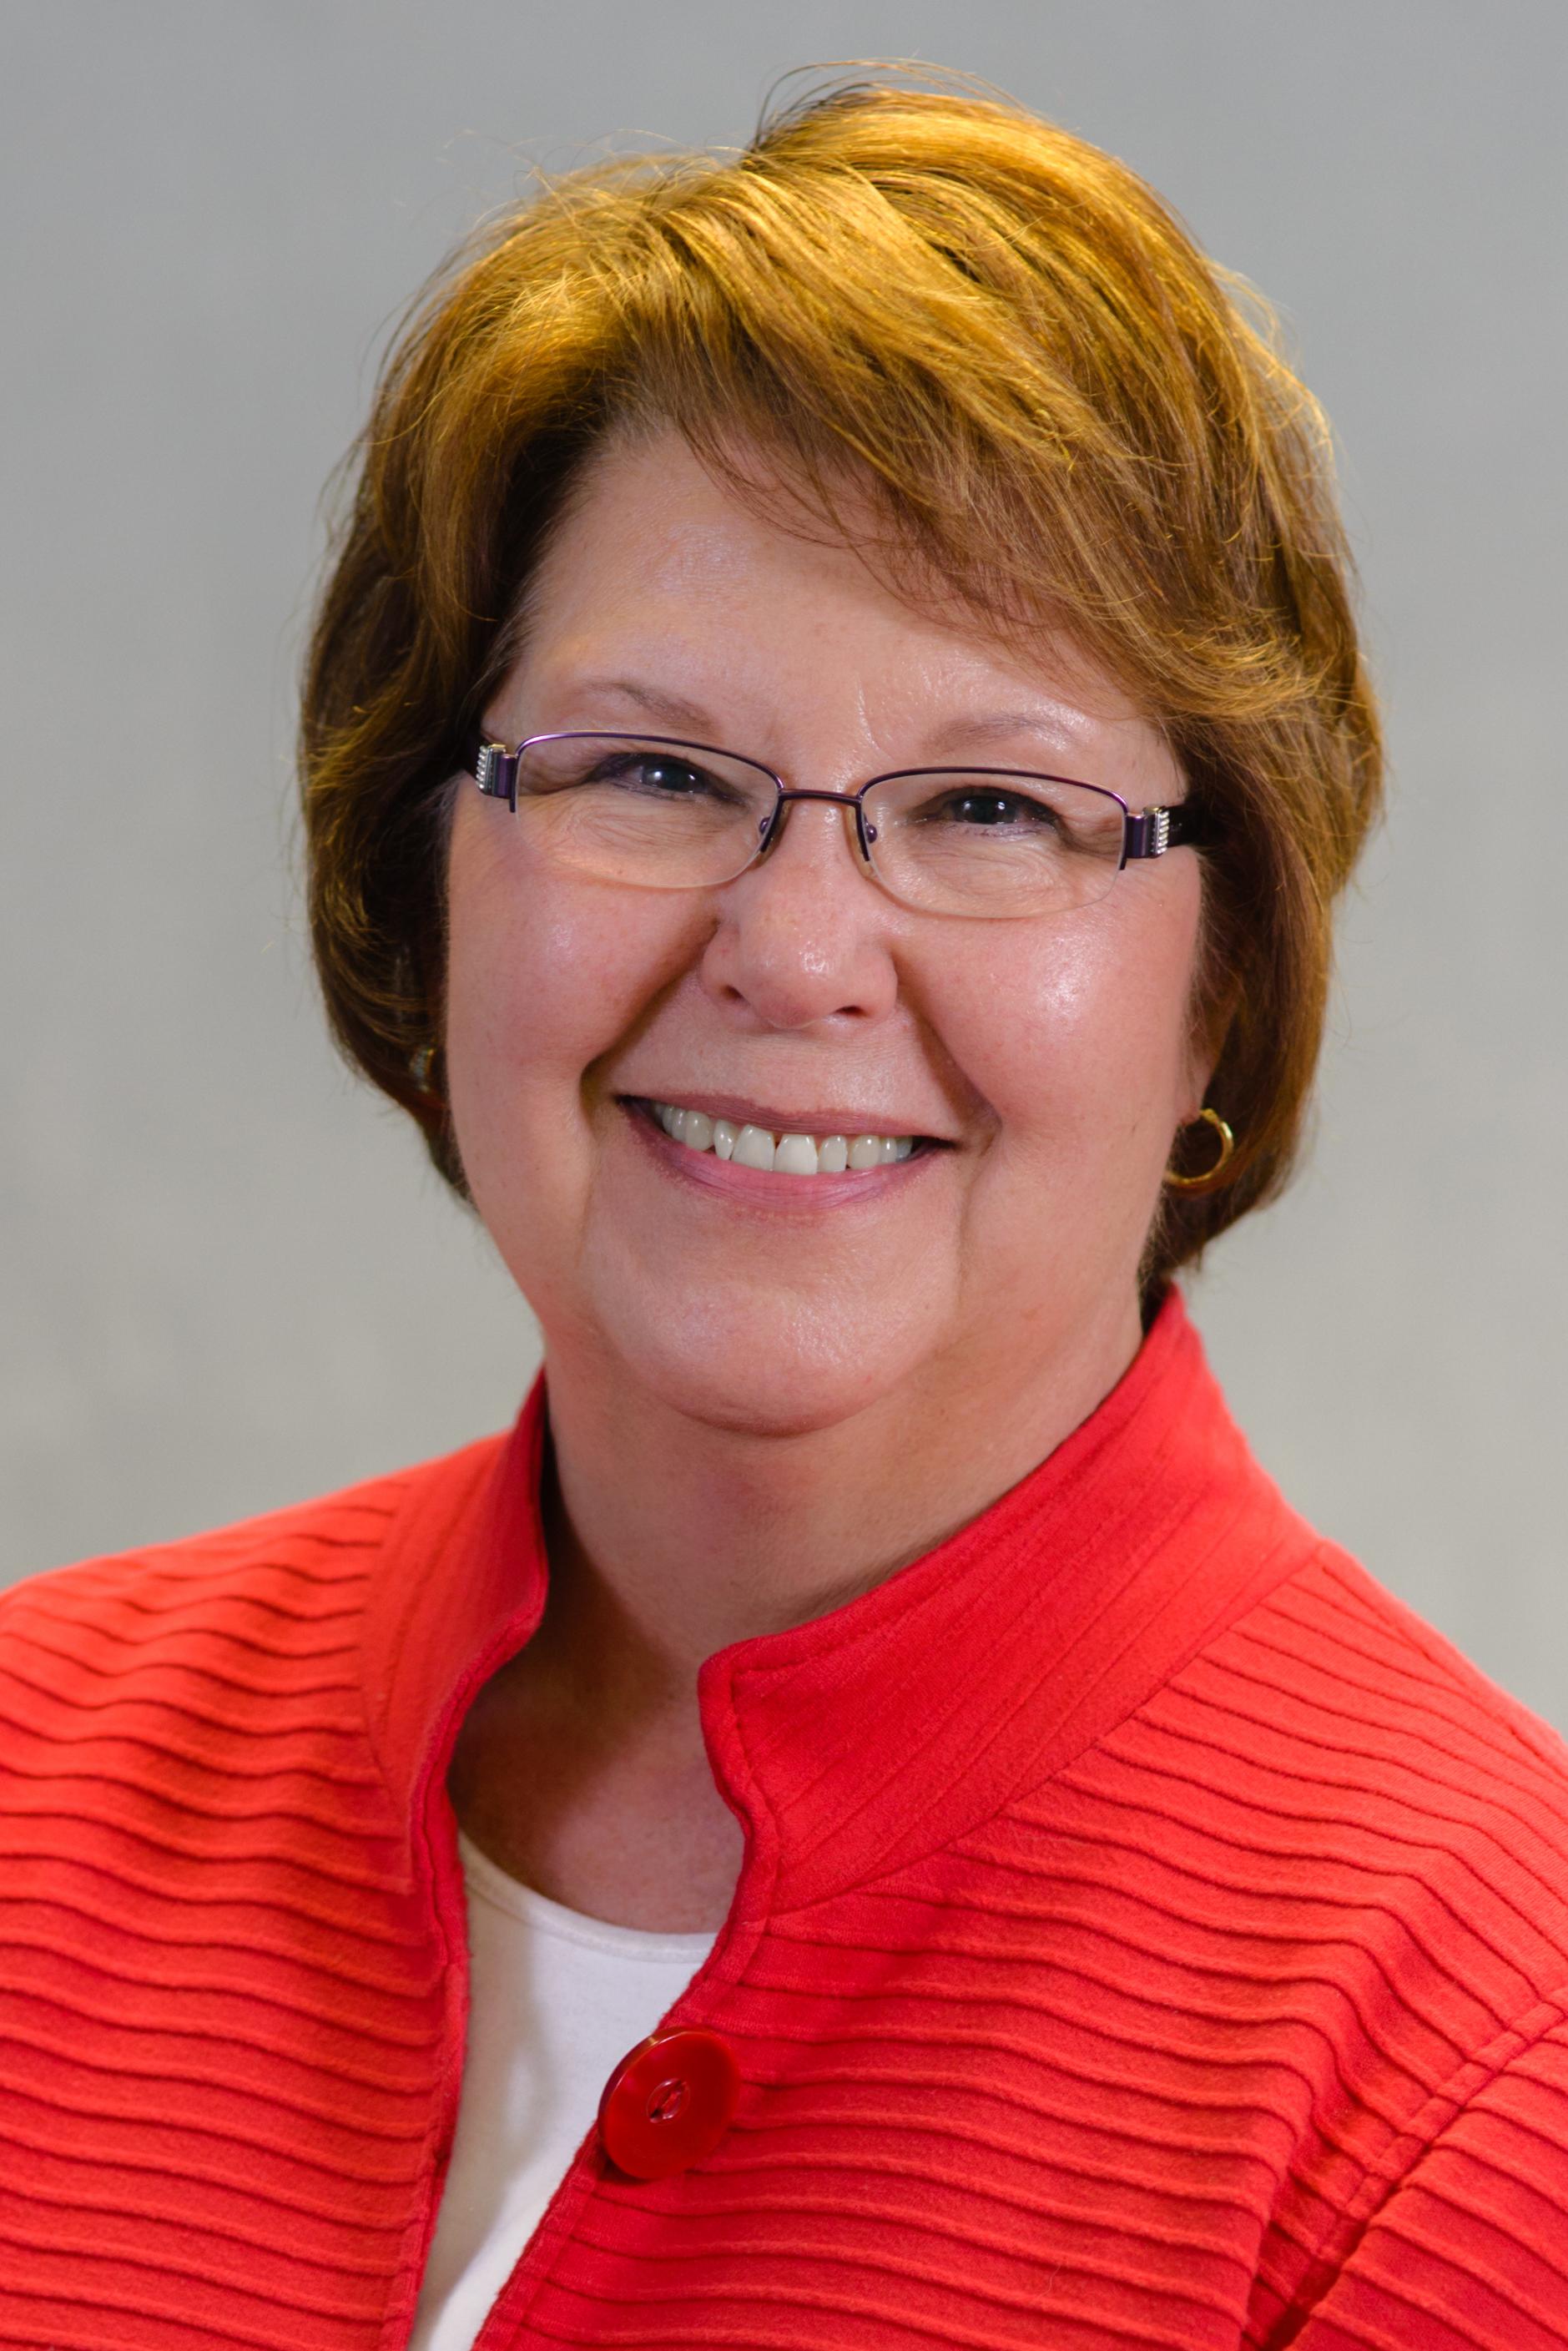 Helen Pietranczyk, President